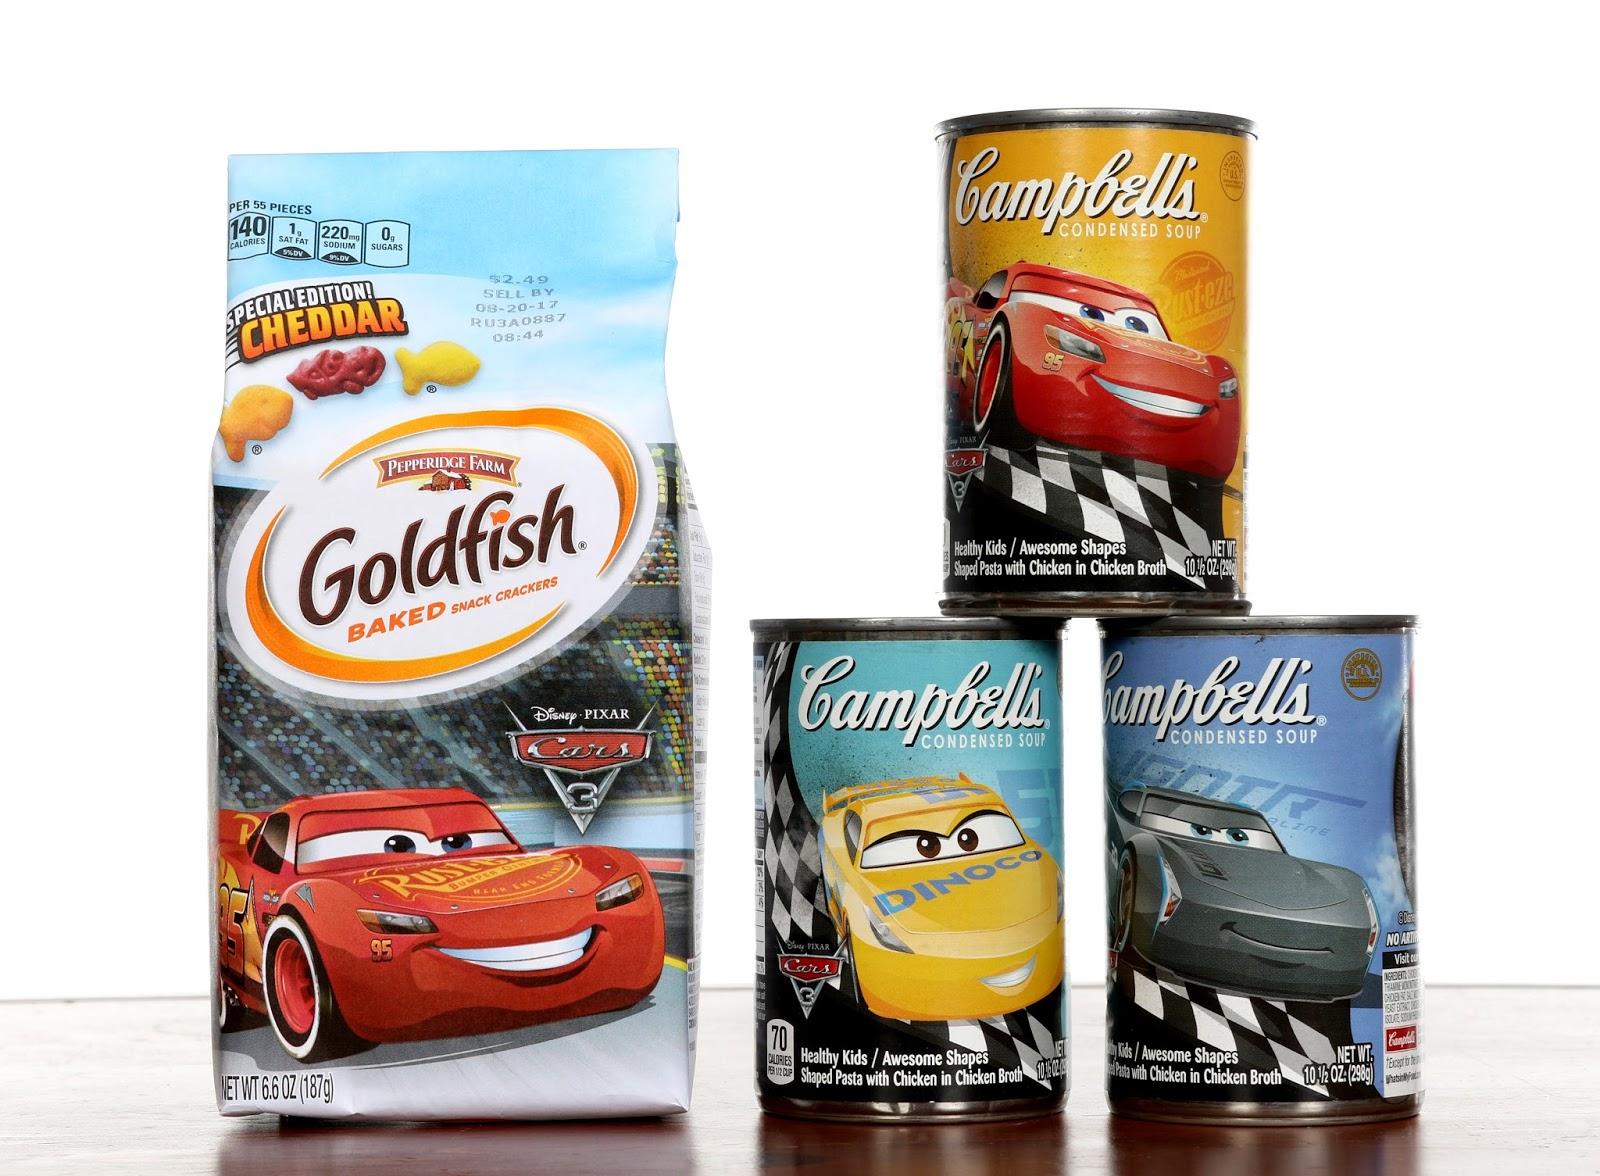 disney pixar Cars 3 Pepperidge Farm Goldfish & Campbell's Soup